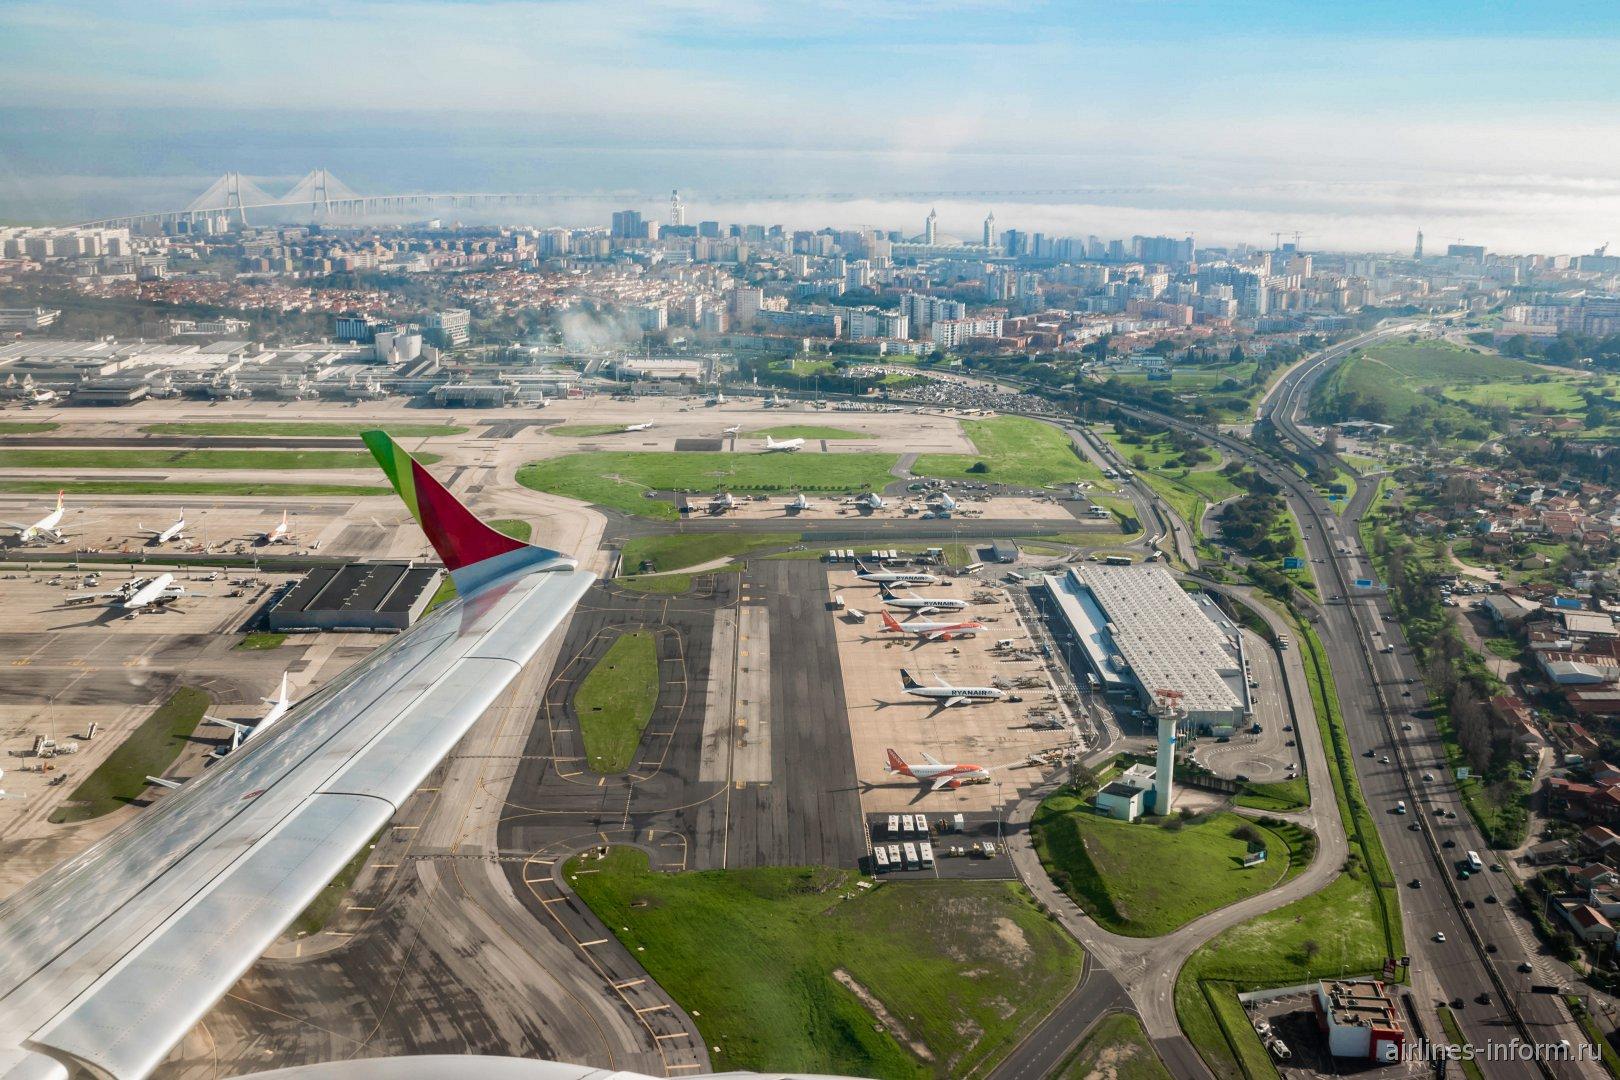 Вид на аэропорт Лиссабона при взлете - на переднем плане терминал 2, на заднем плане терминал 1